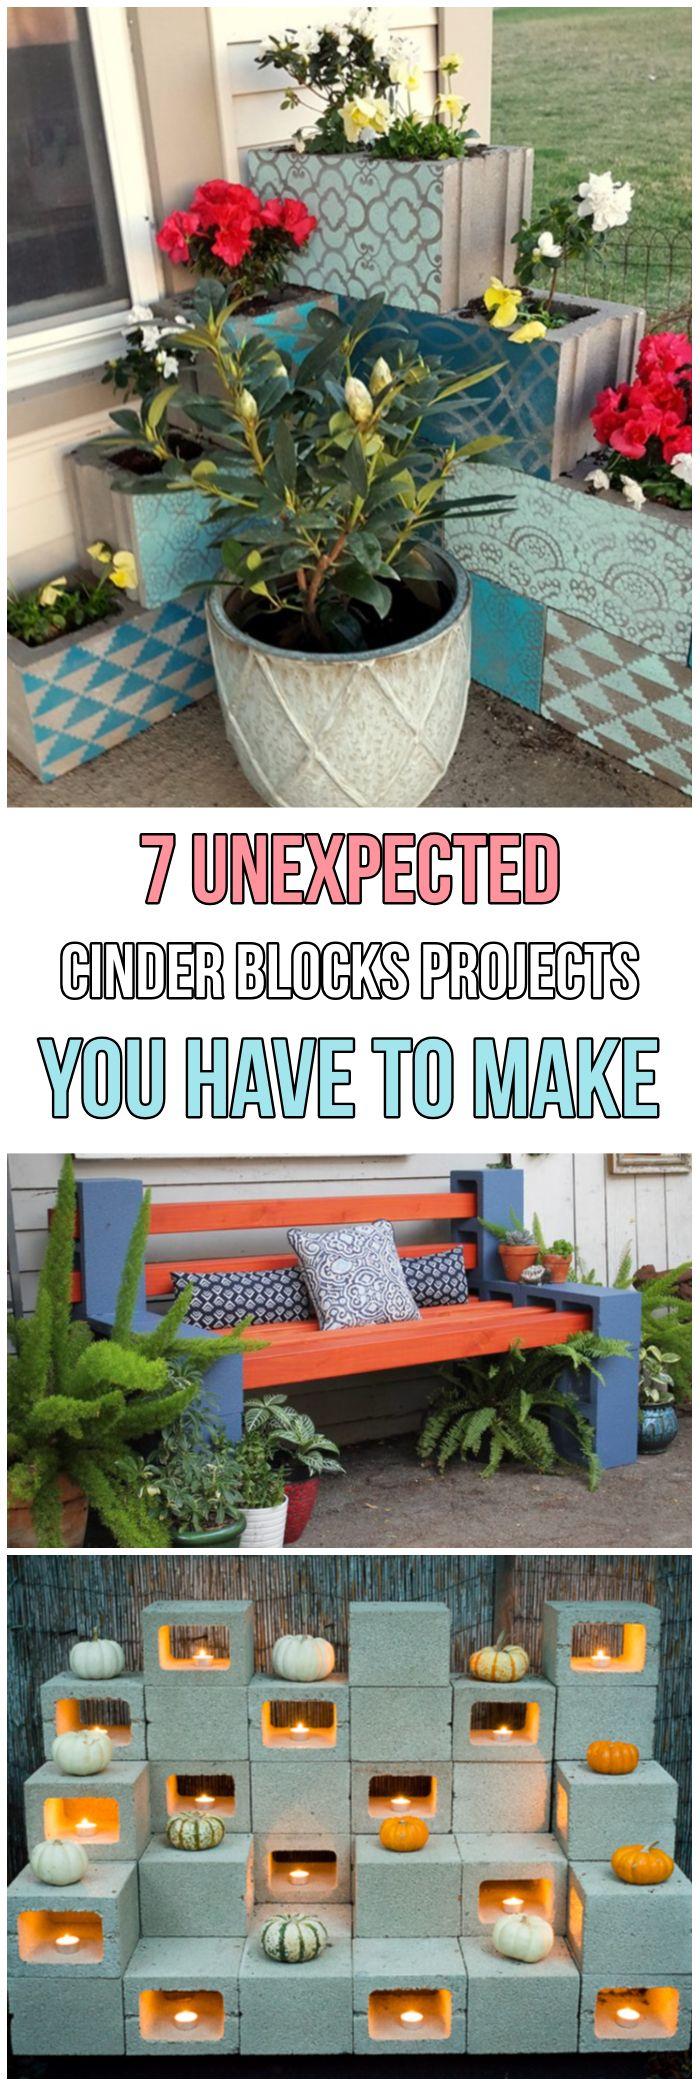 7 Unexpected Cinder Blocks Projects You Have To Make #diy #diyproject #howto #gardendesign #gardenideas #garden #backyard #cinderblocks #bench #handmade ... & 7 Unexpected Cinder Blocks Projects You Have To Make | porch ...